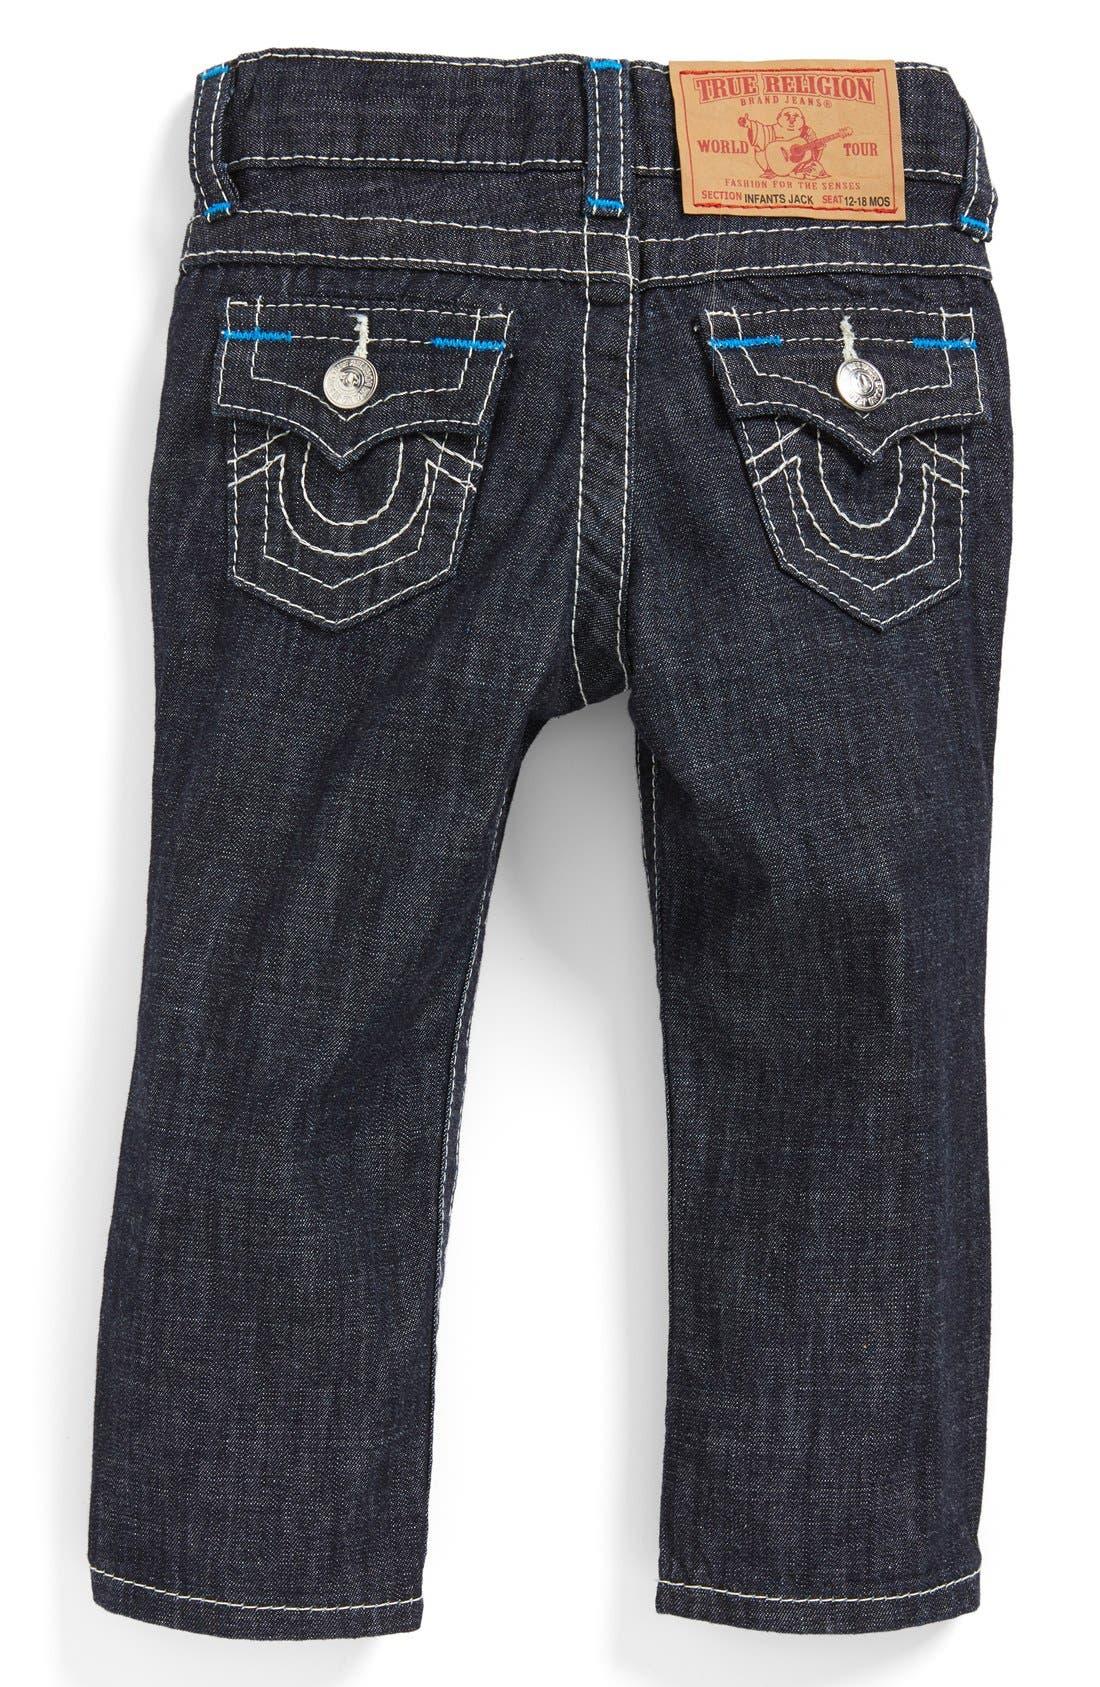 Alternate Image 1 Selected - True Religion Brand Jeans 'Jack' Slim Fit Jeans (Baby Boys)